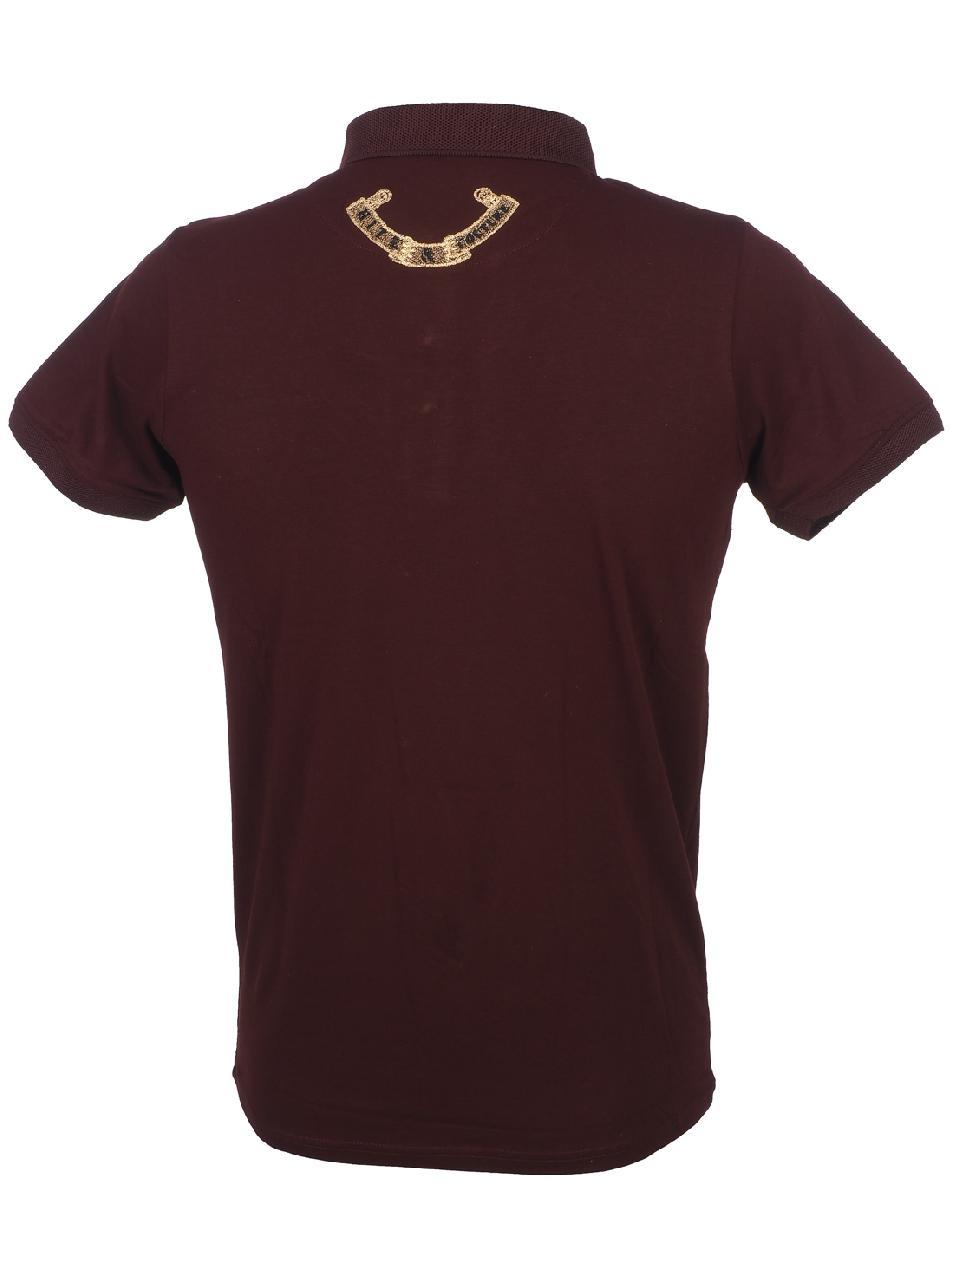 Short-Sleeve-Polo-Hite-Couture-Pamiler-Bordeaux-Mc-Polo-Red-11573-New thumbnail 5